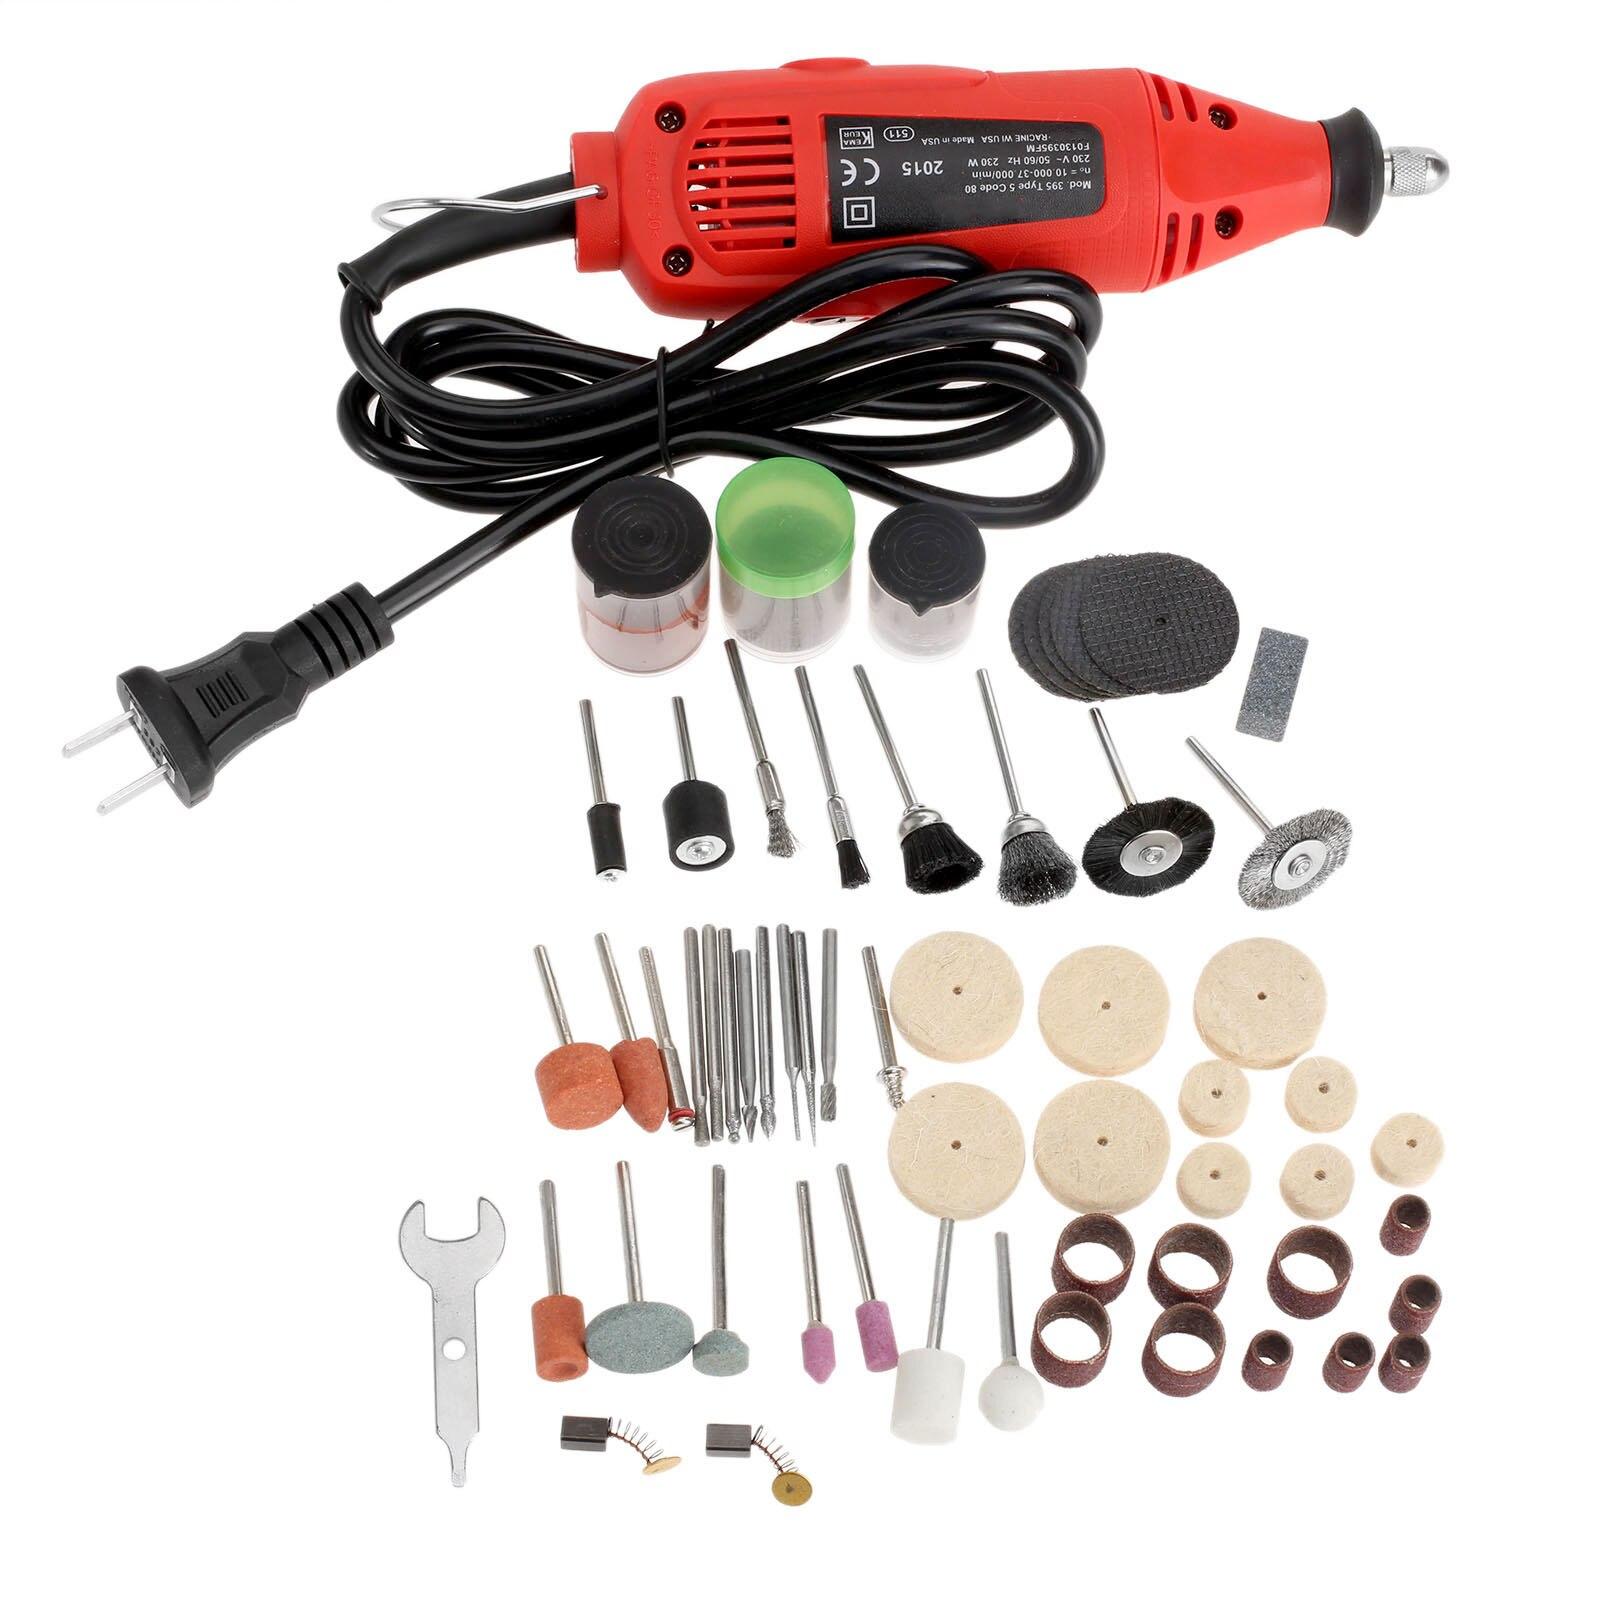 100Pcs Grinding Polishing Sanding Tools Rotary Tools +230W Mini Grinding Machine Mini Drill Grinder Electric Tool Variable Speed  цены